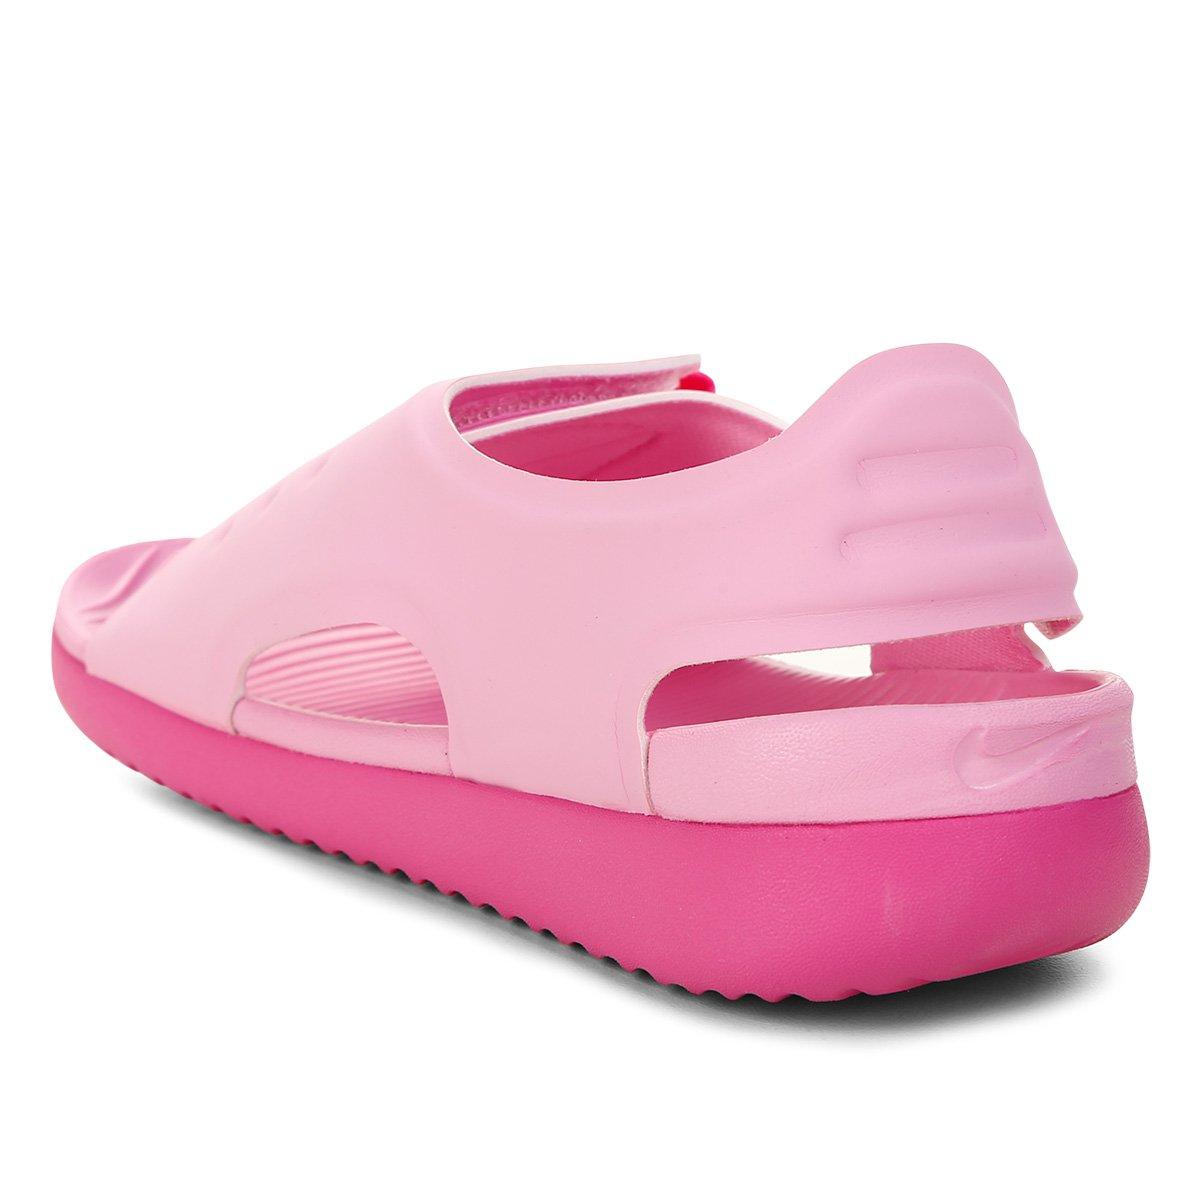 Sandália Infantil Nike Sunray Adjust 5 - Tam: 31 - 1